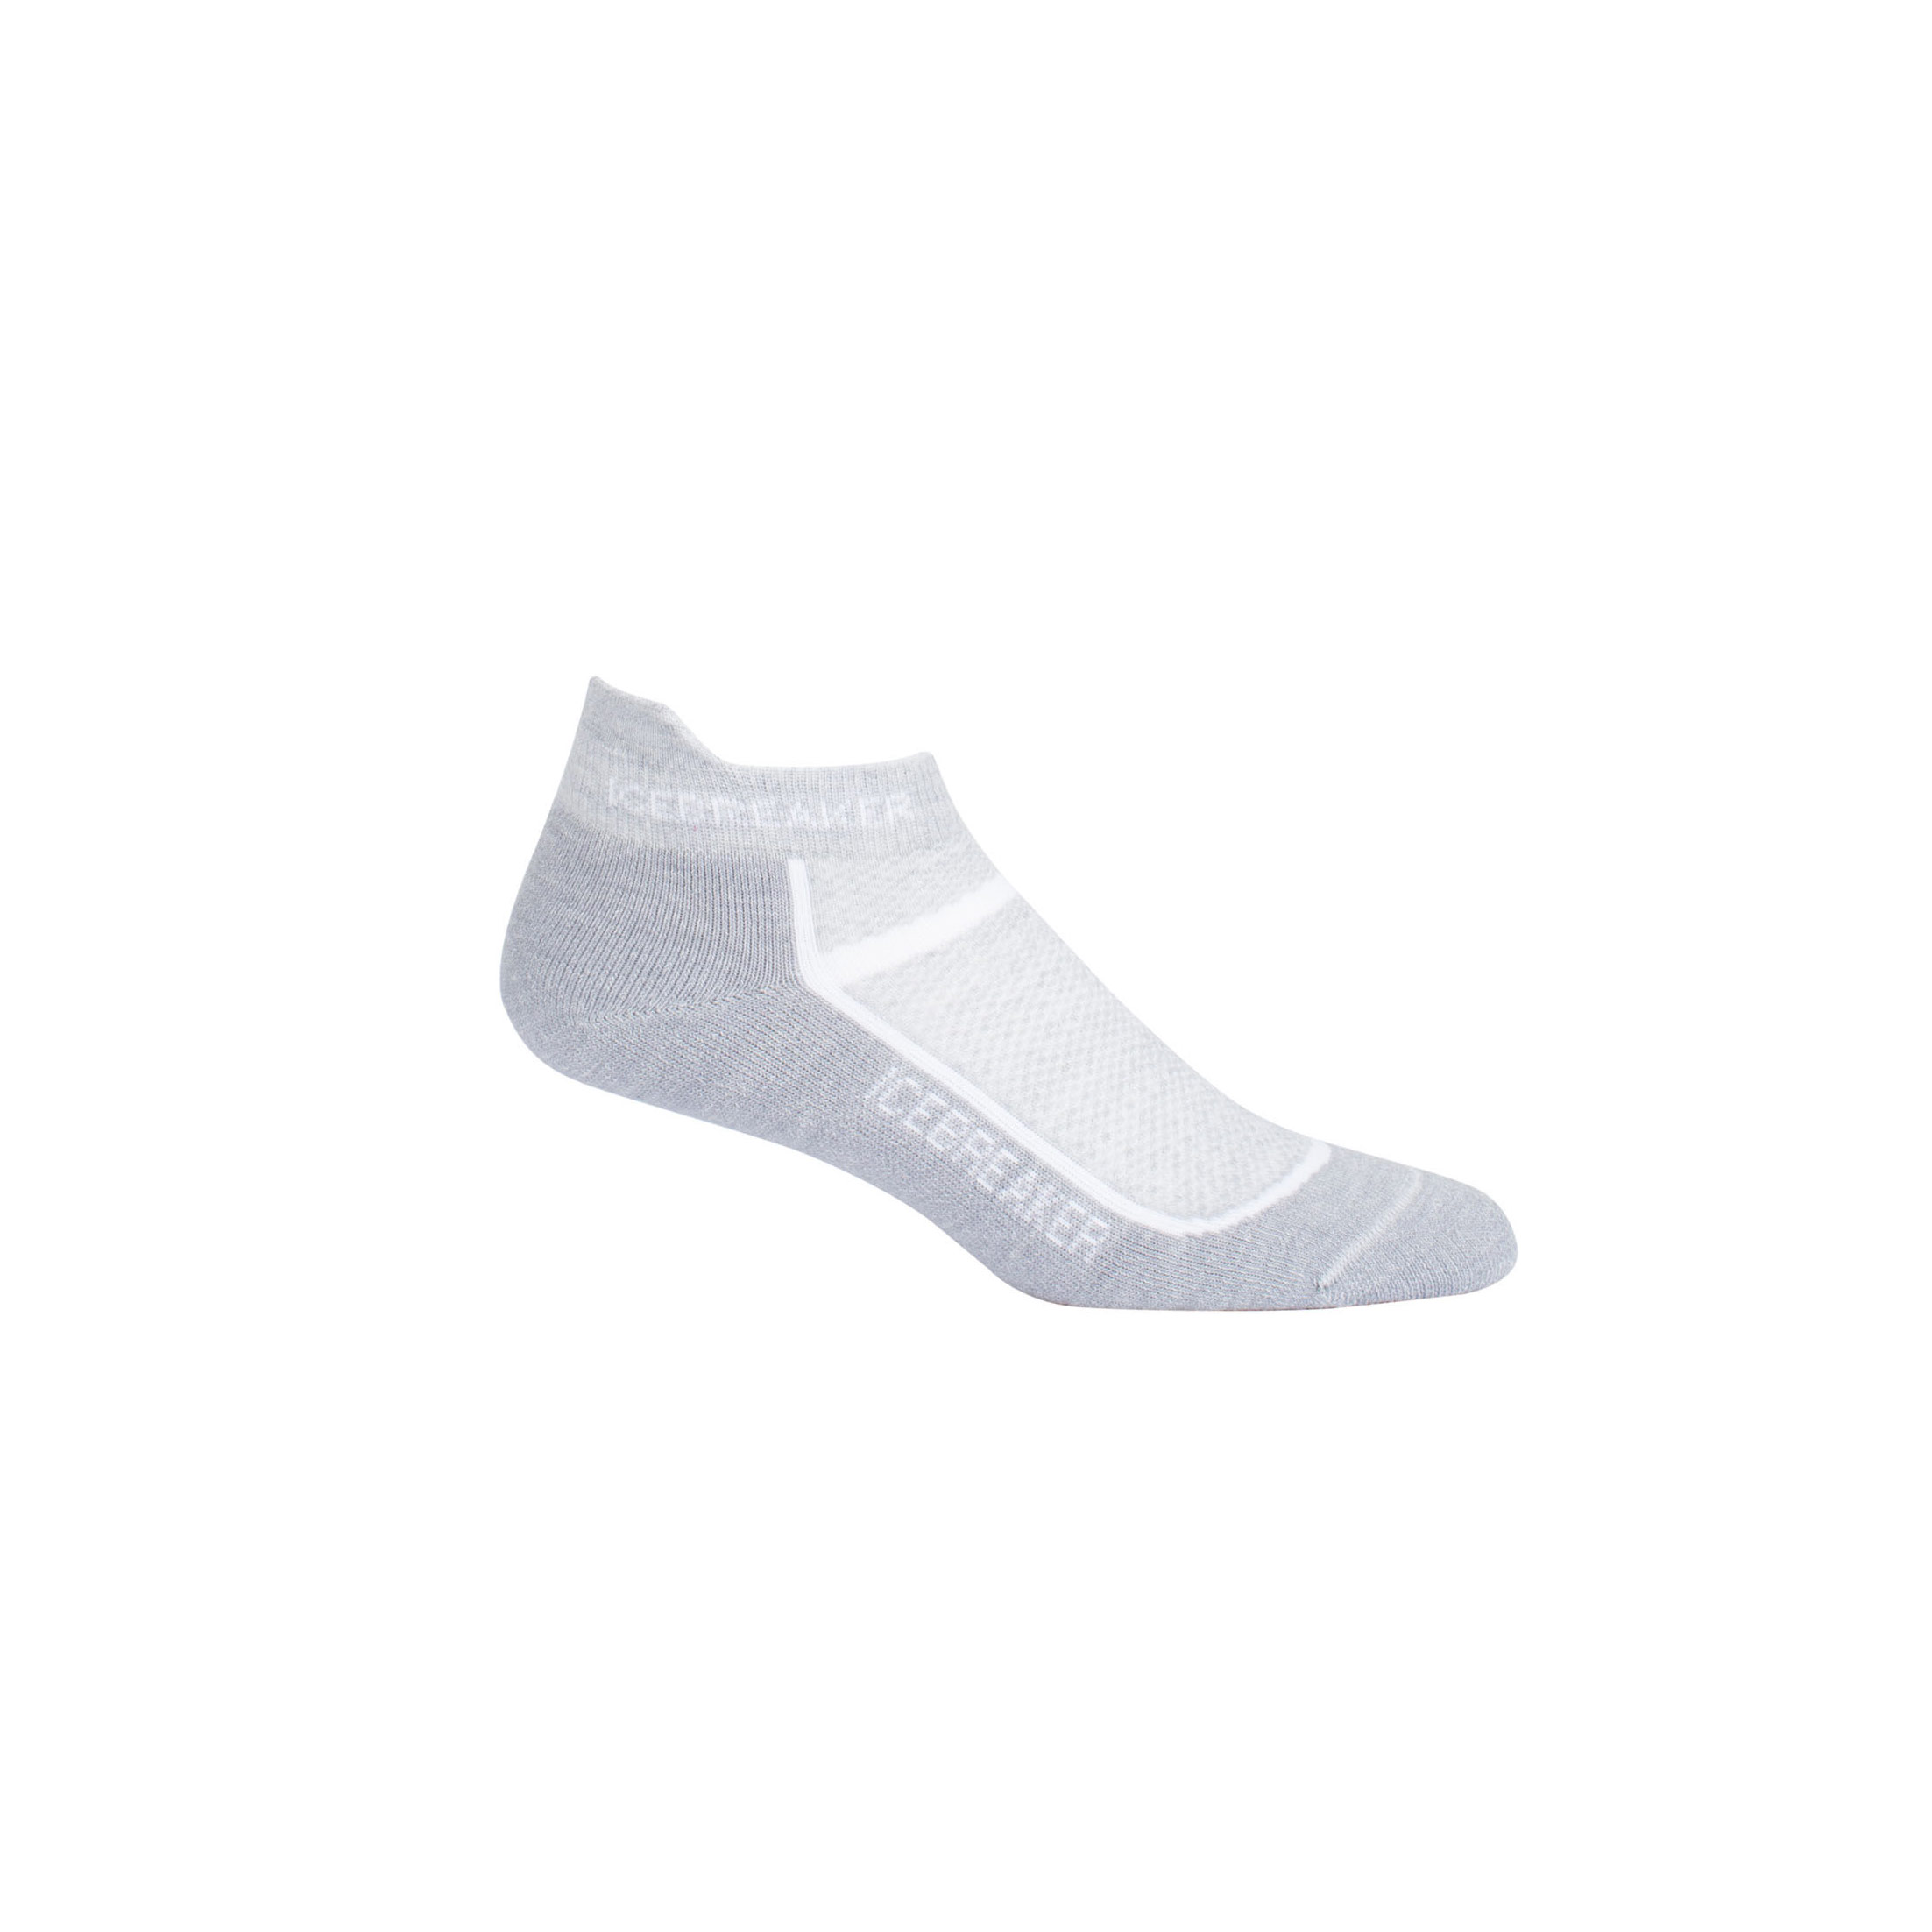 Multisport Light Micro Sock - Women's